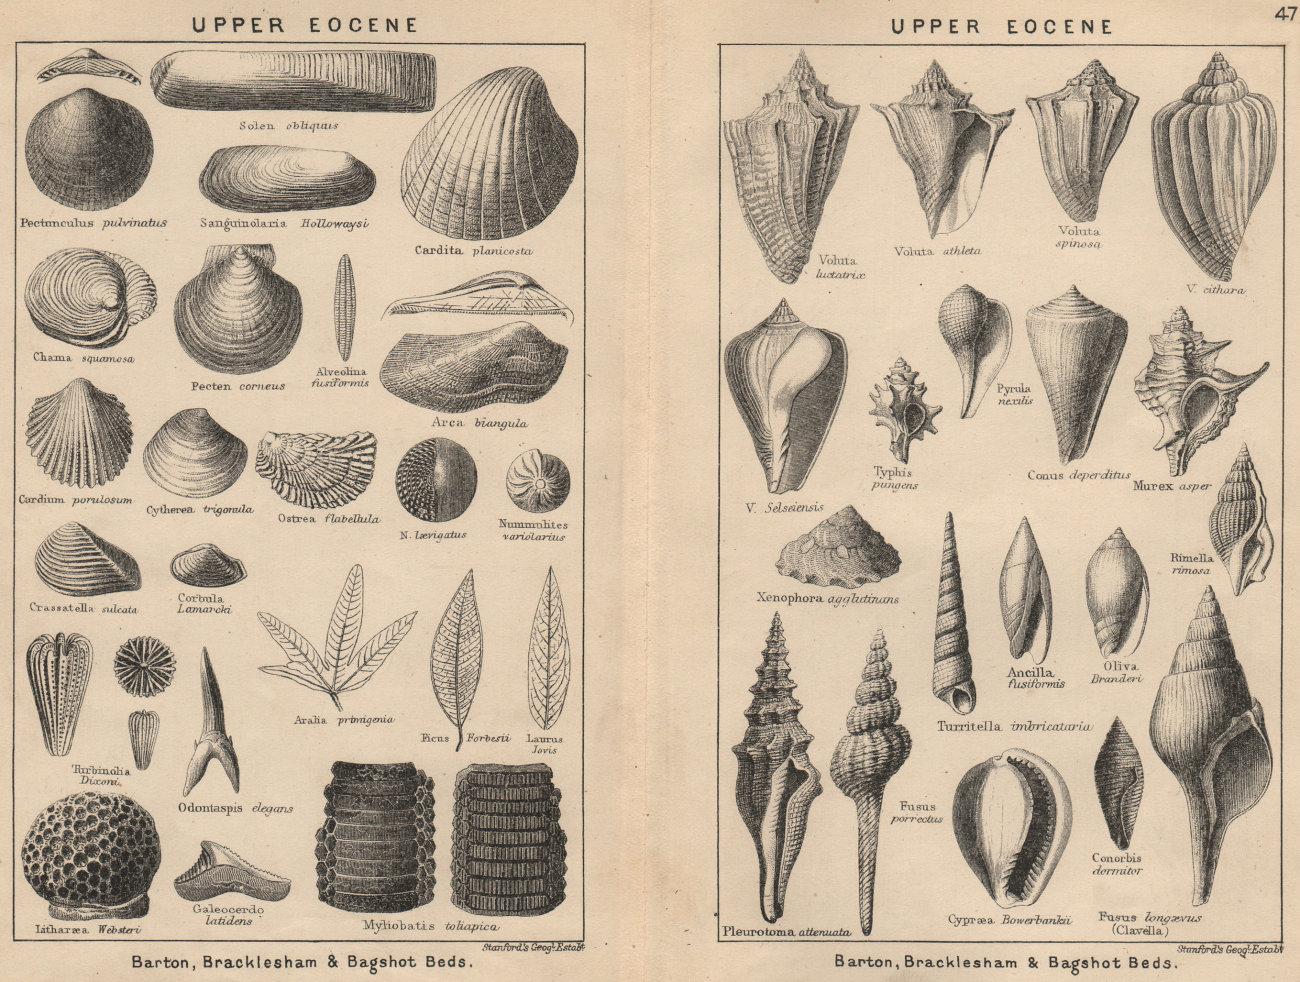 Associate Product BRITISH FOSSILS. Upper Eocene. STANFORD 1913 old antique vintage print picture